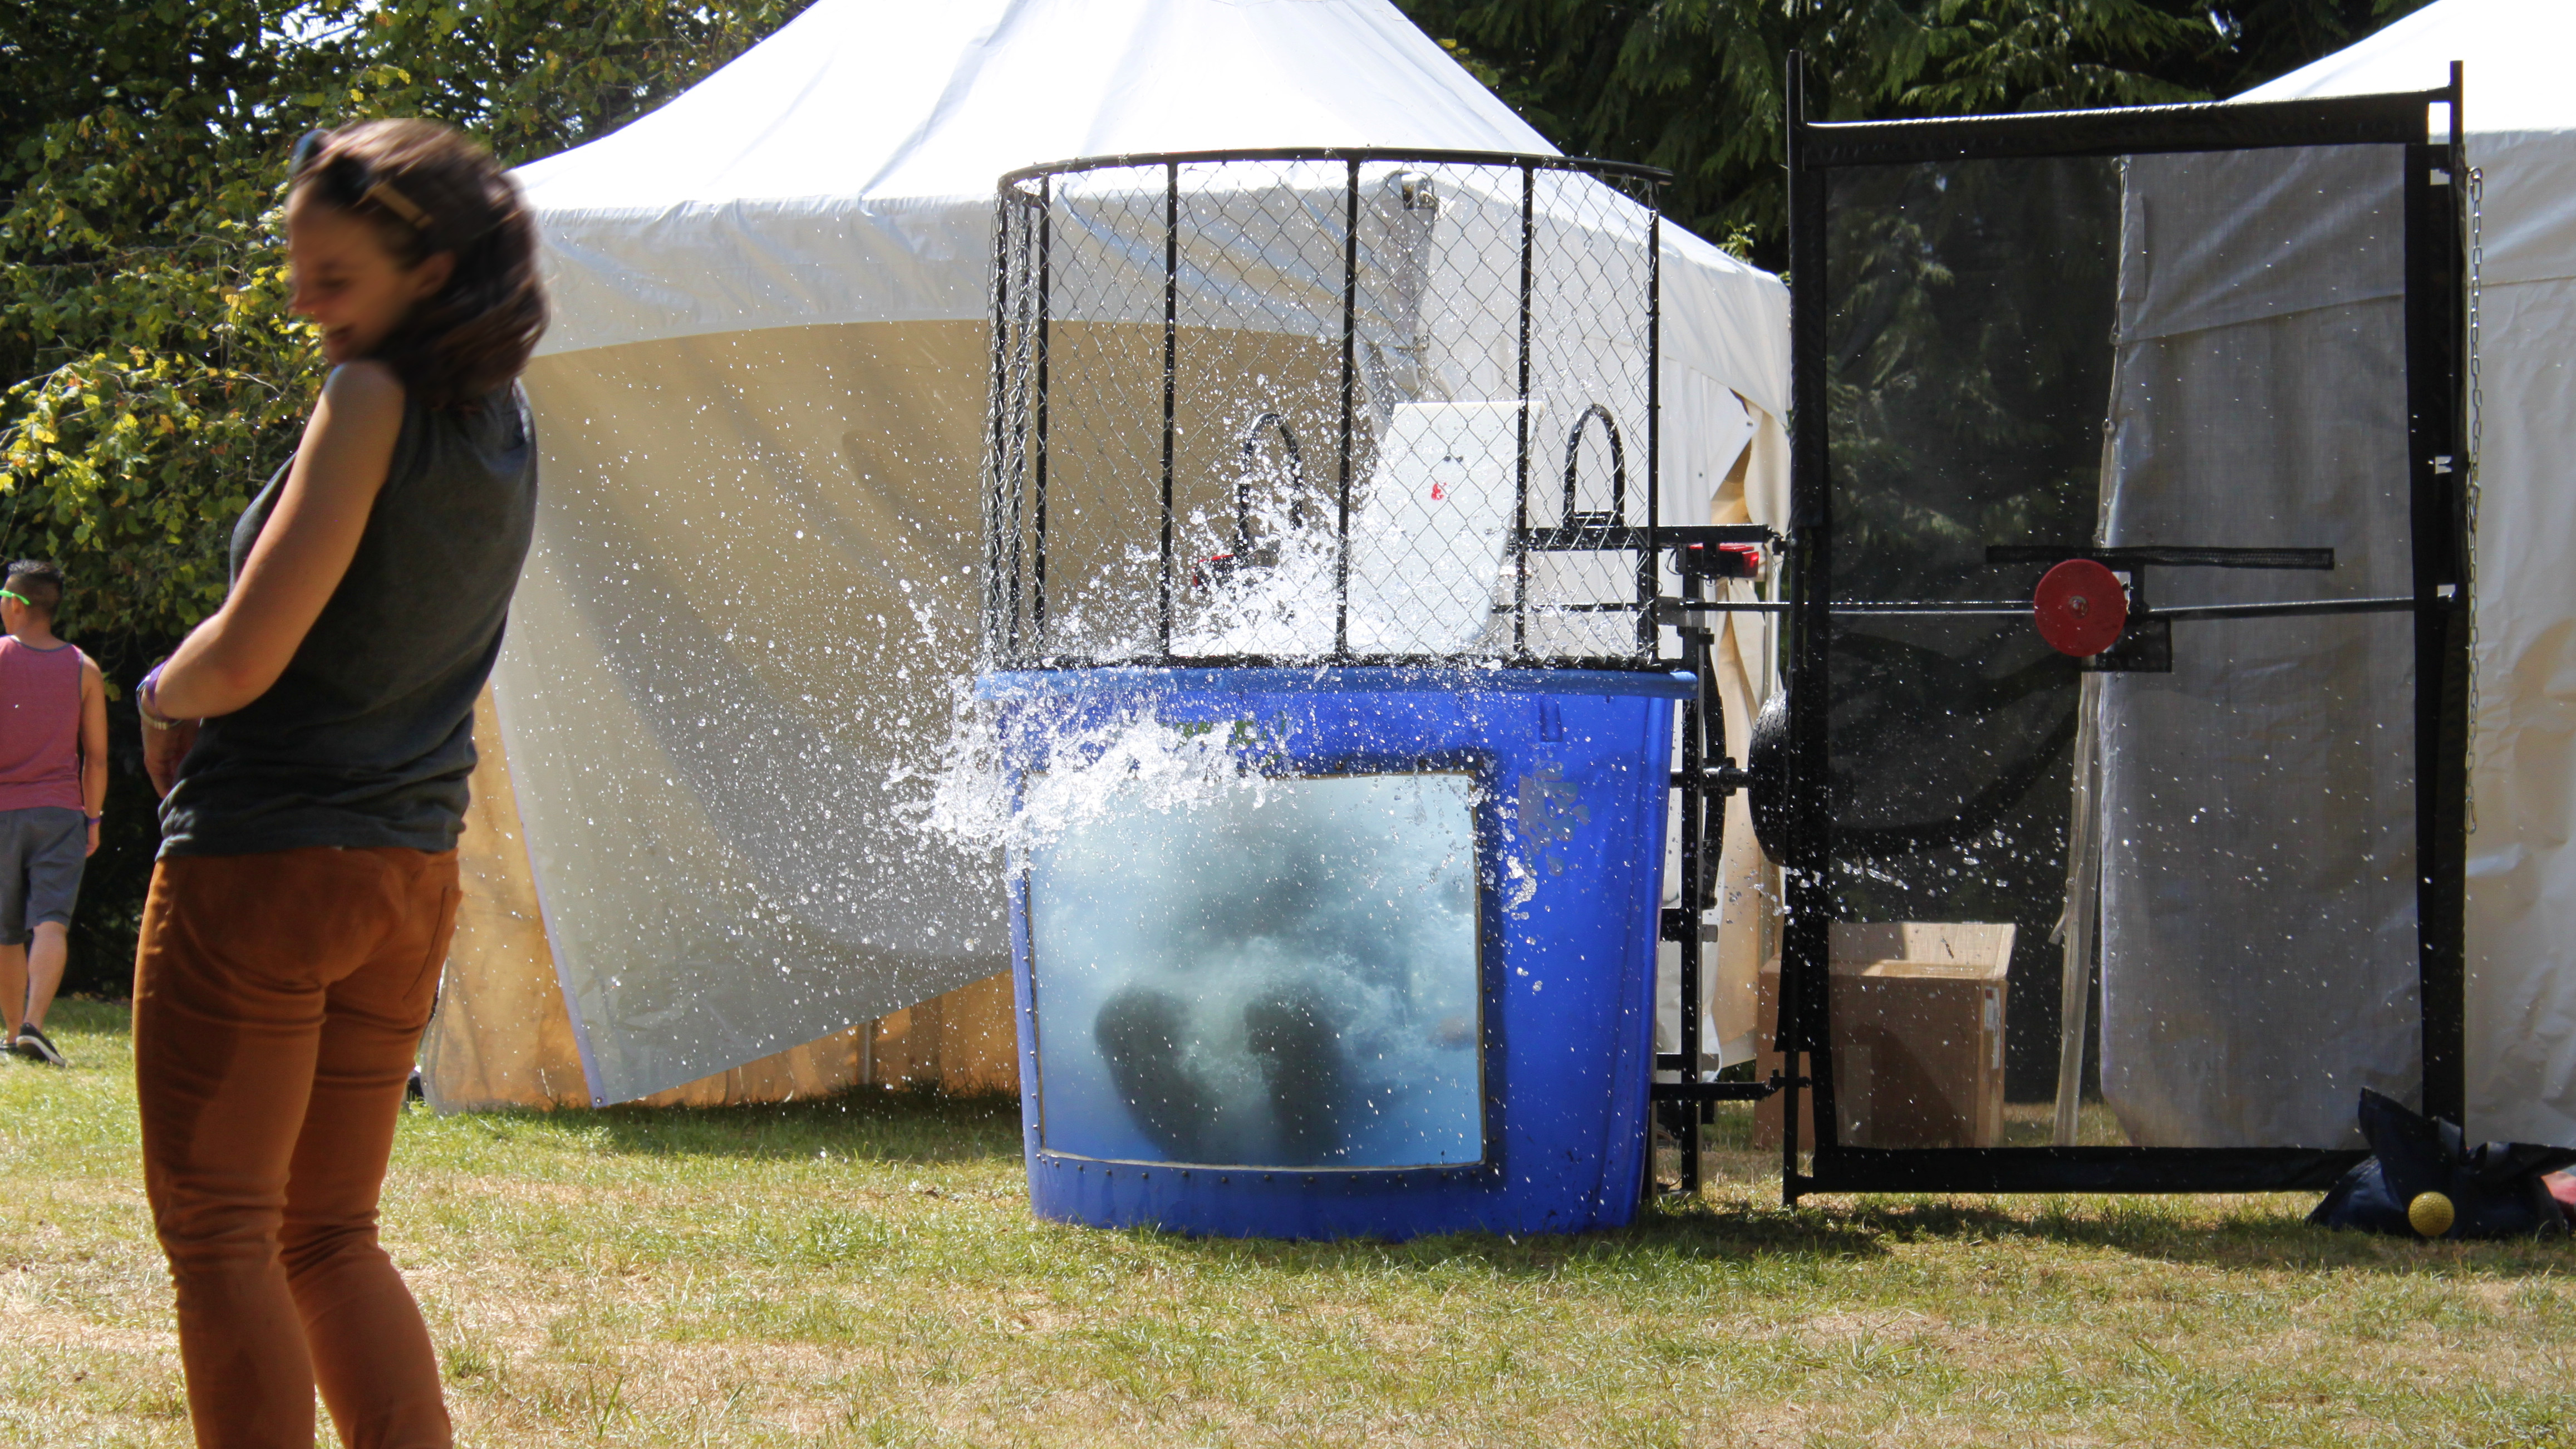 windowed dunk tank rental � national event pros